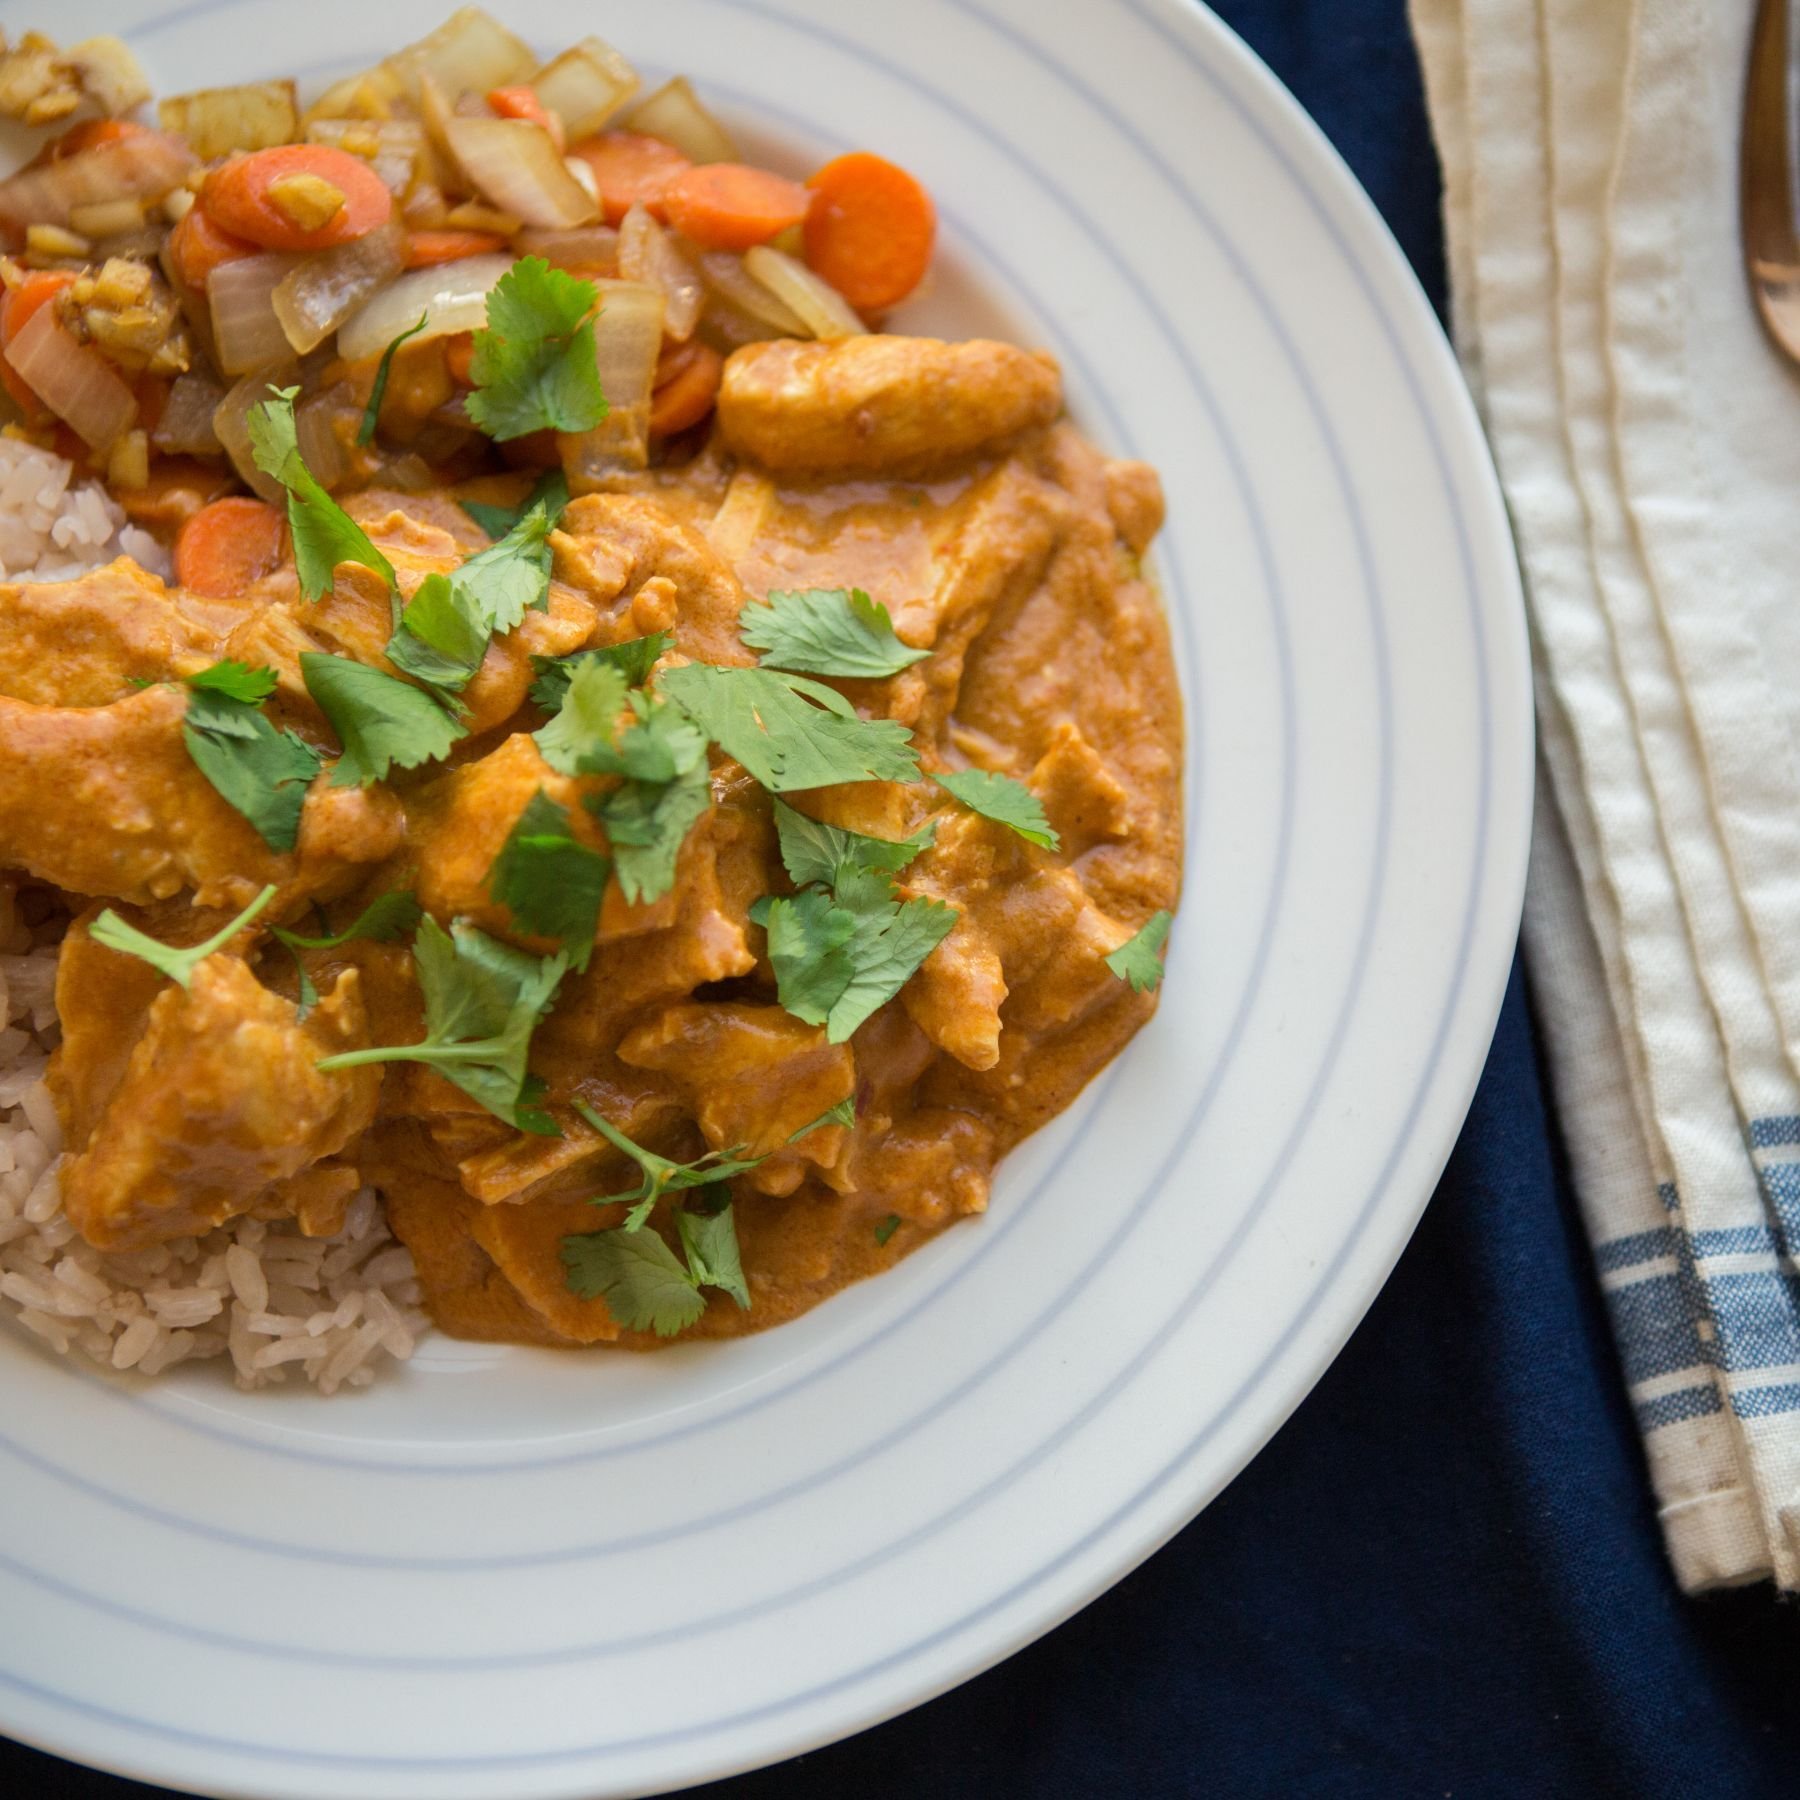 Healthy Simple Meal Ideas Thai Peanut Chicken Shopmeals Relayfoods